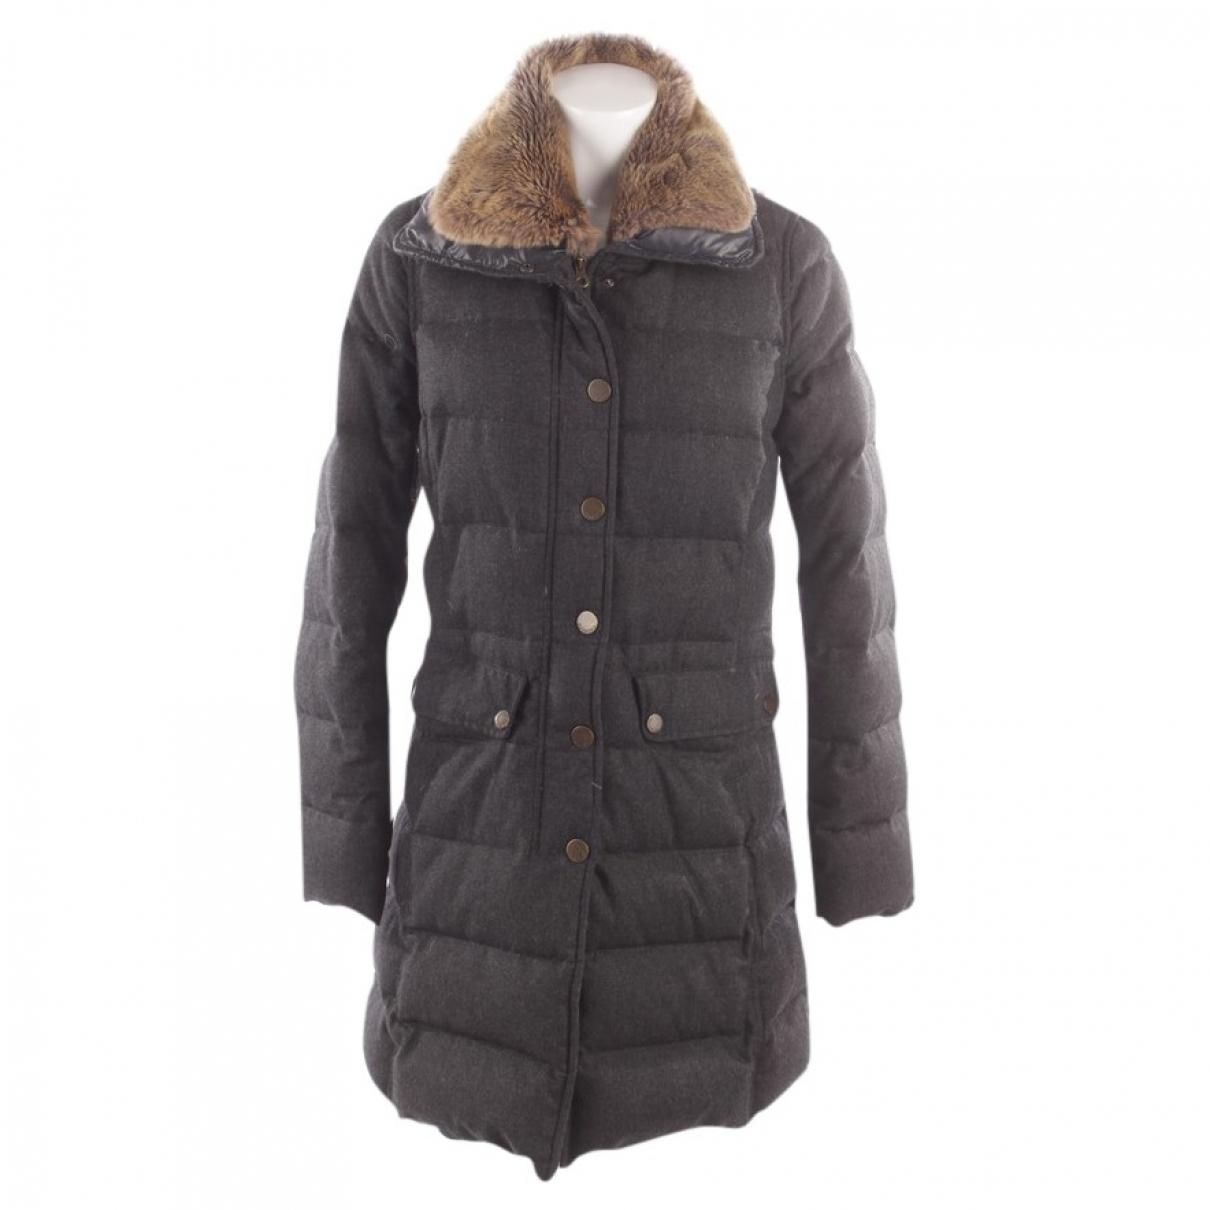 Duvetica \N Grey Wool jacket for Women 40 FR